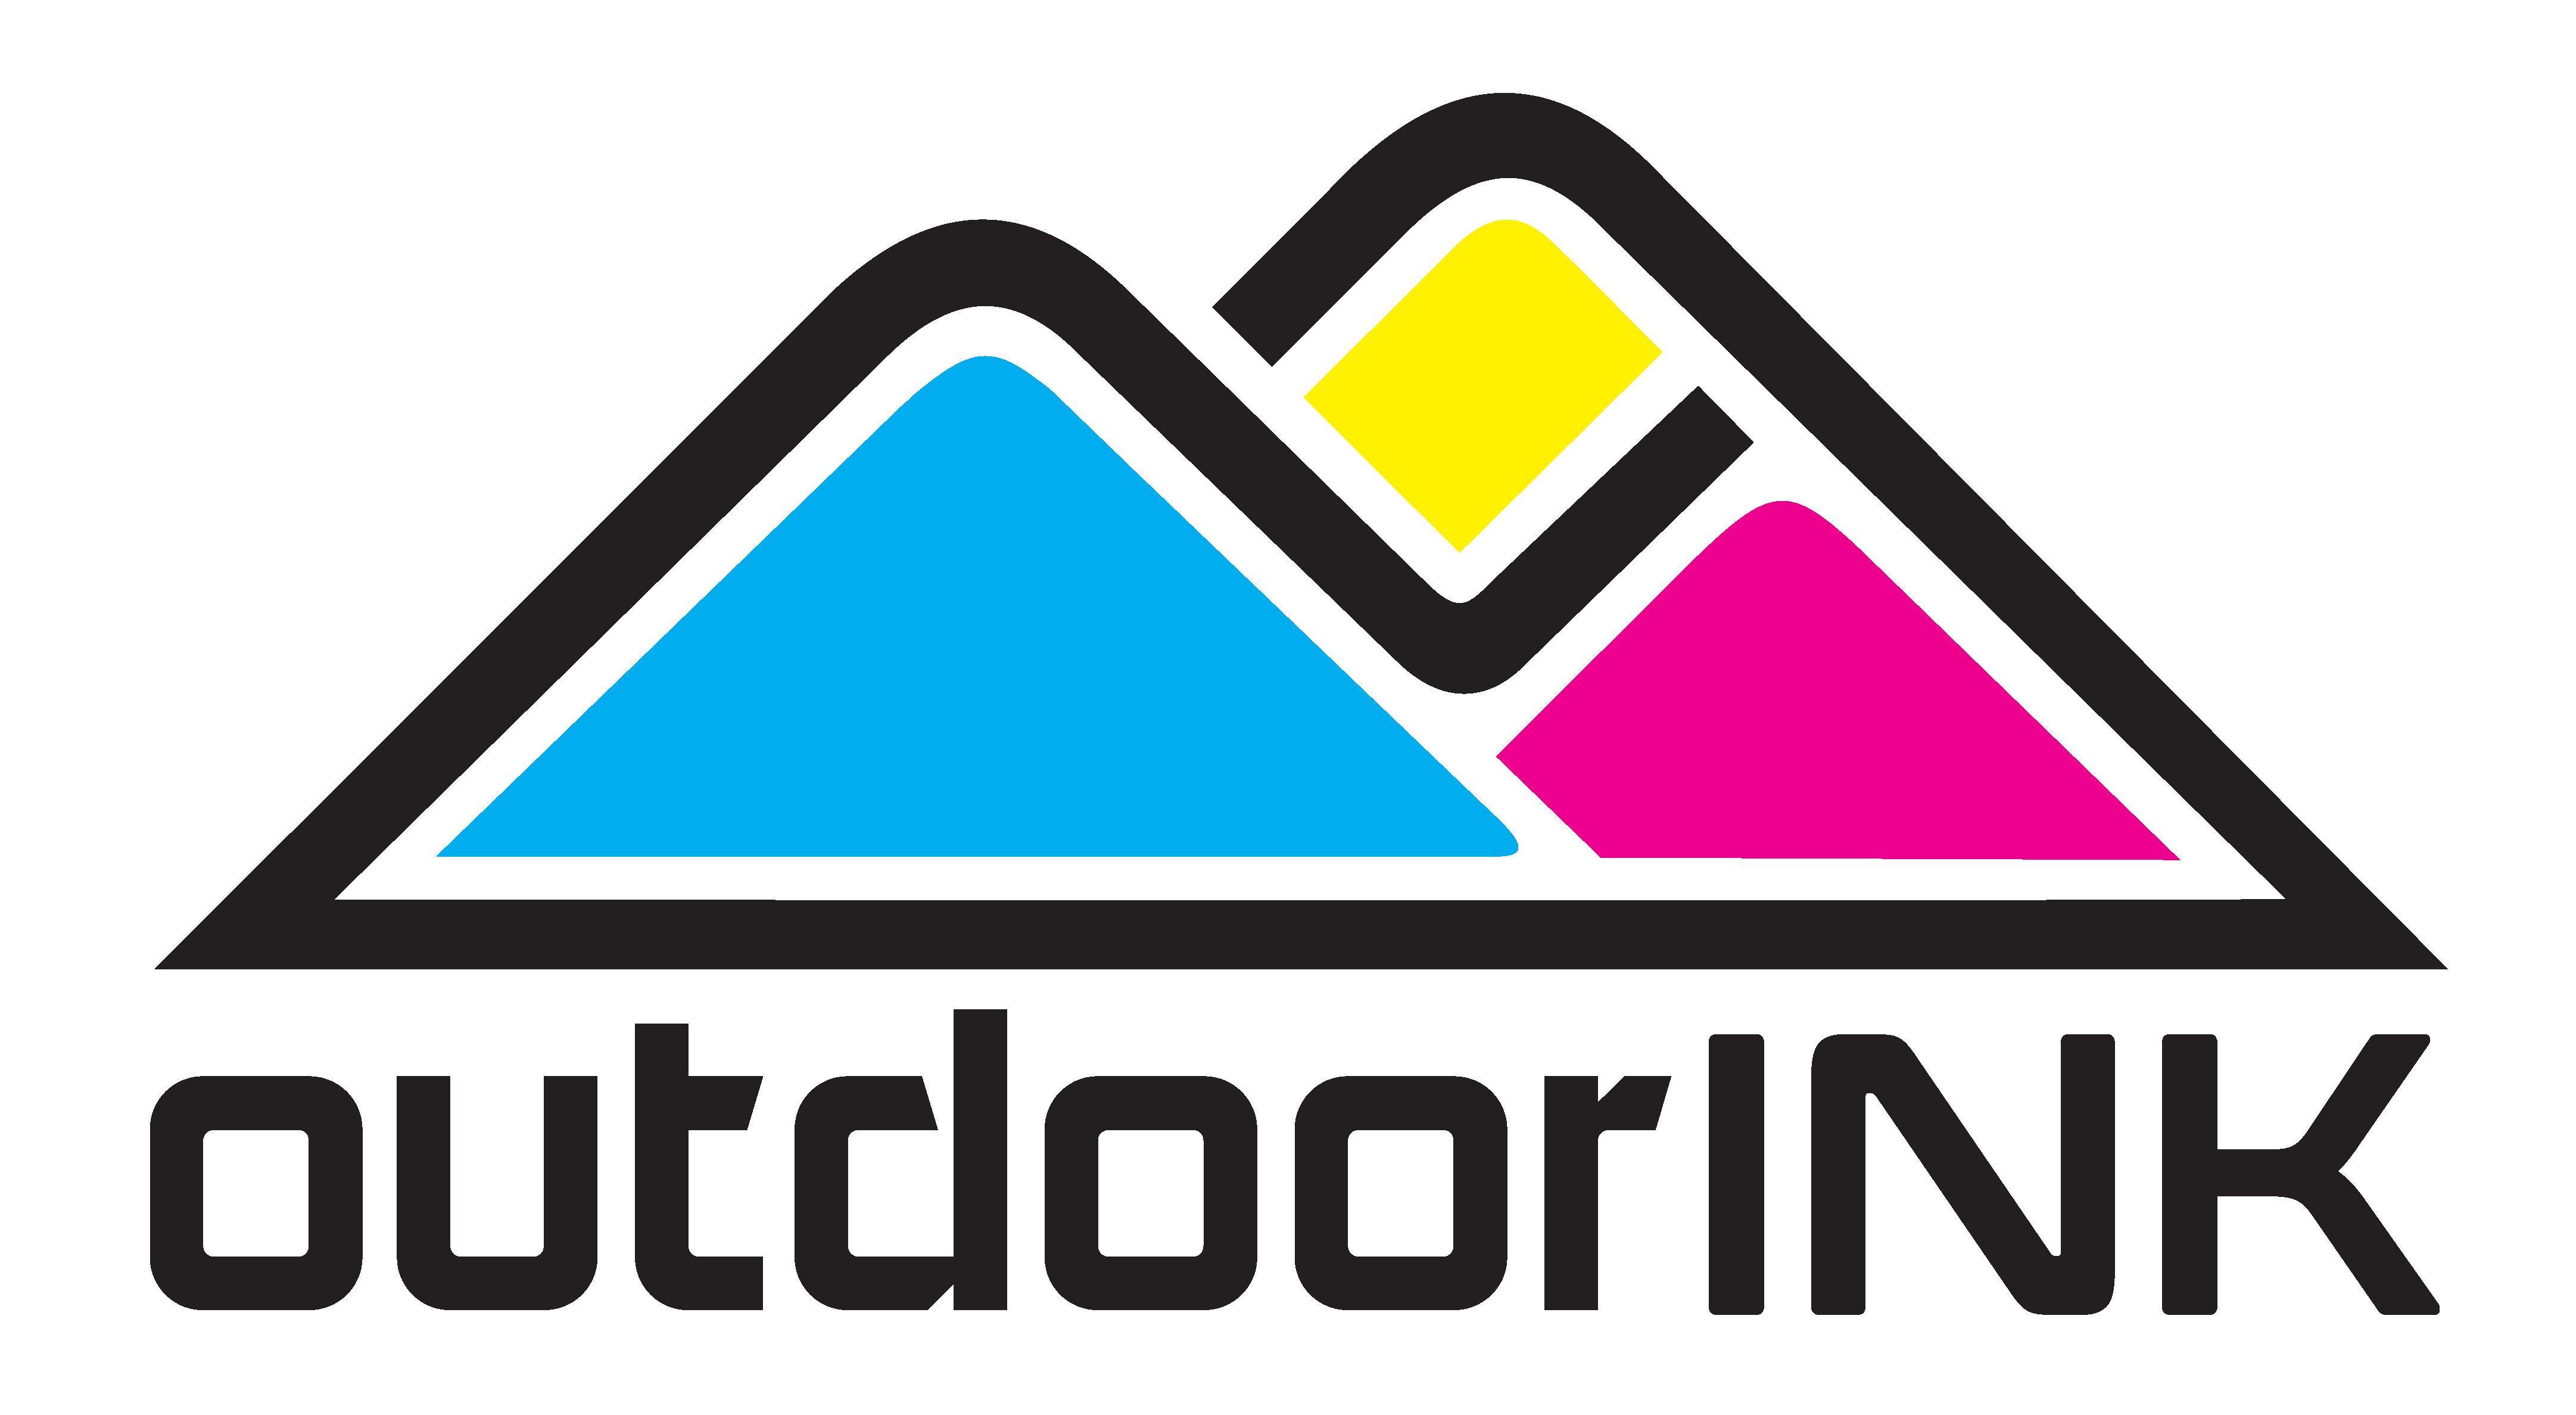 outdoorink-logo-black.png